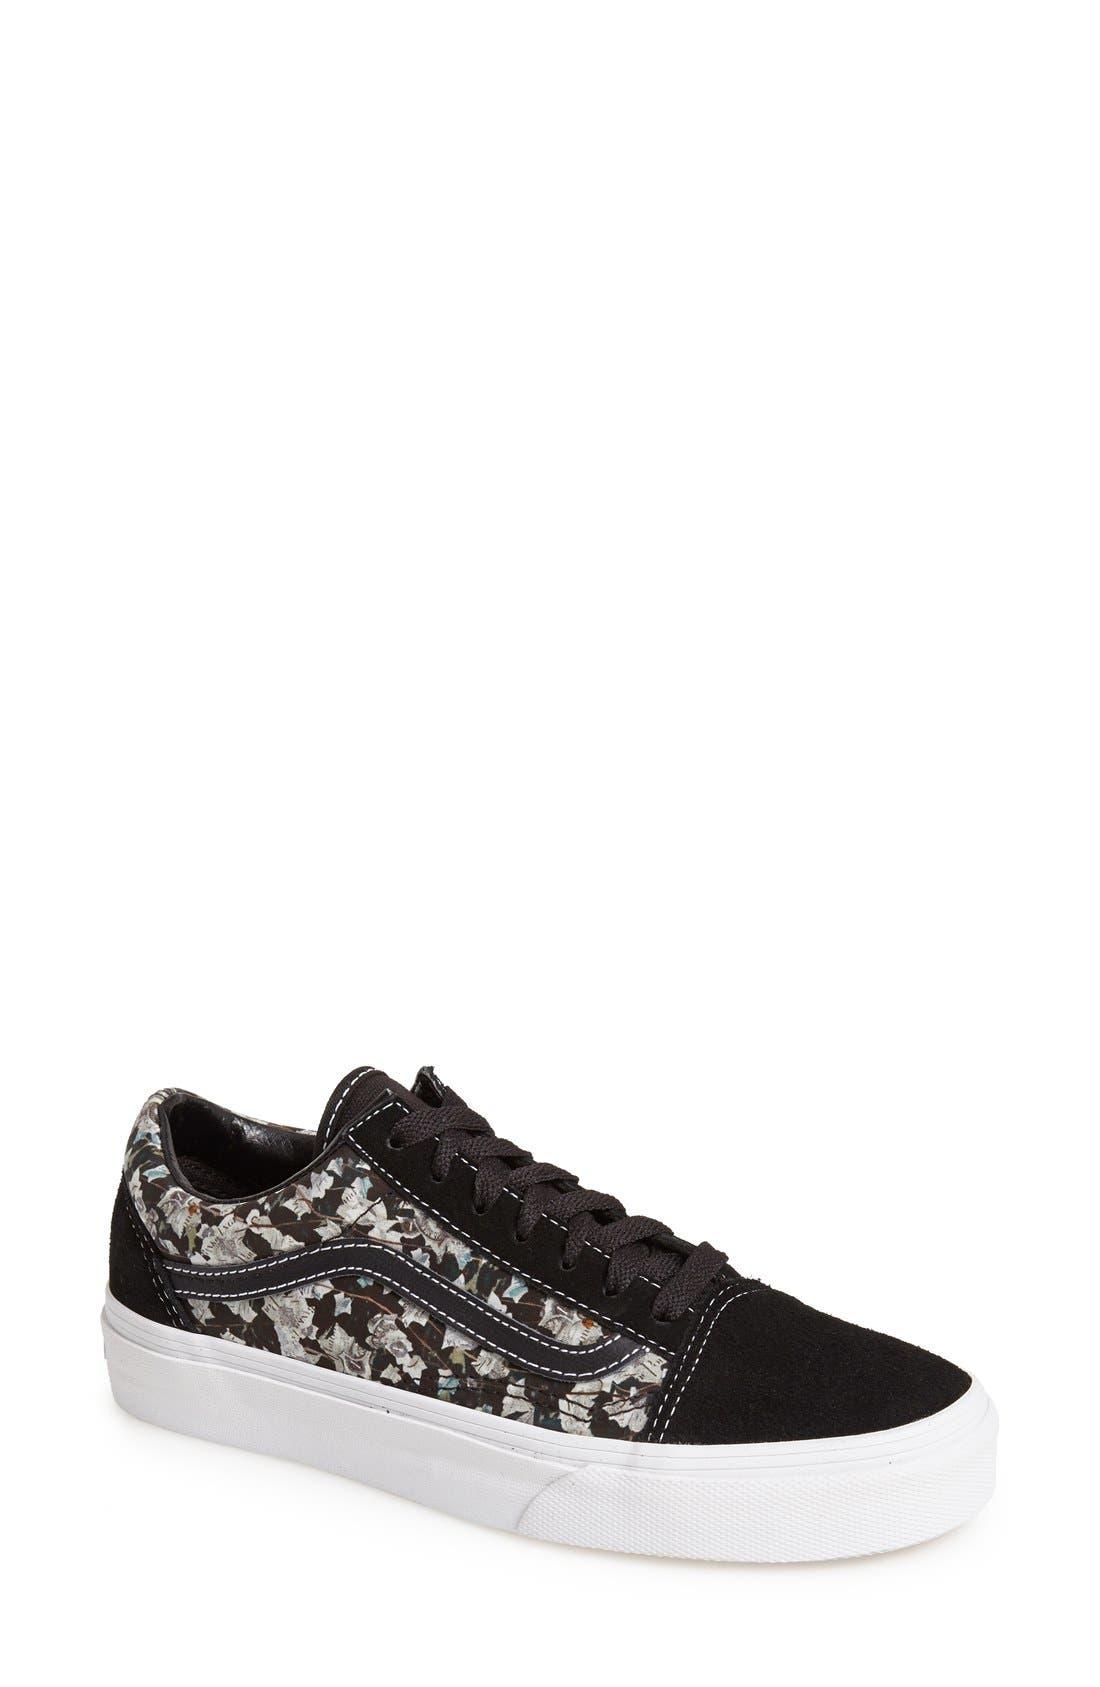 Alternate Image 1 Selected - Vans 'Old Skool - Liberty Era' Sneaker (Women)